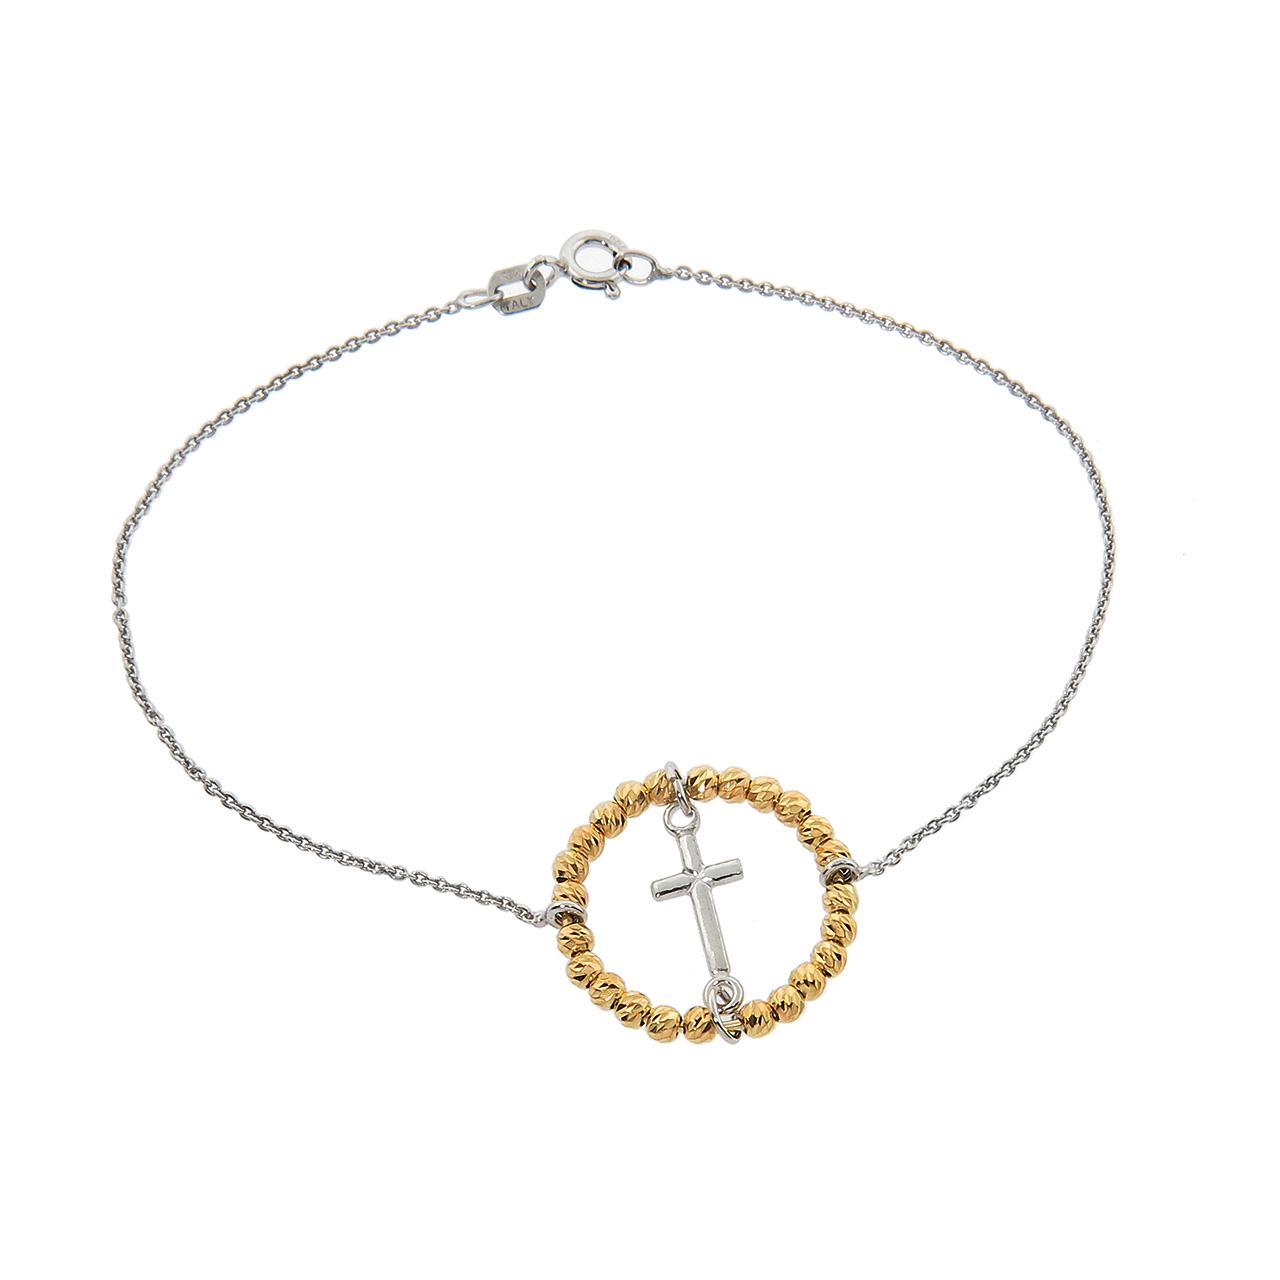 Italian Gold Plated Solid Sterling Silver Diamond Cut Bead Cross Brace